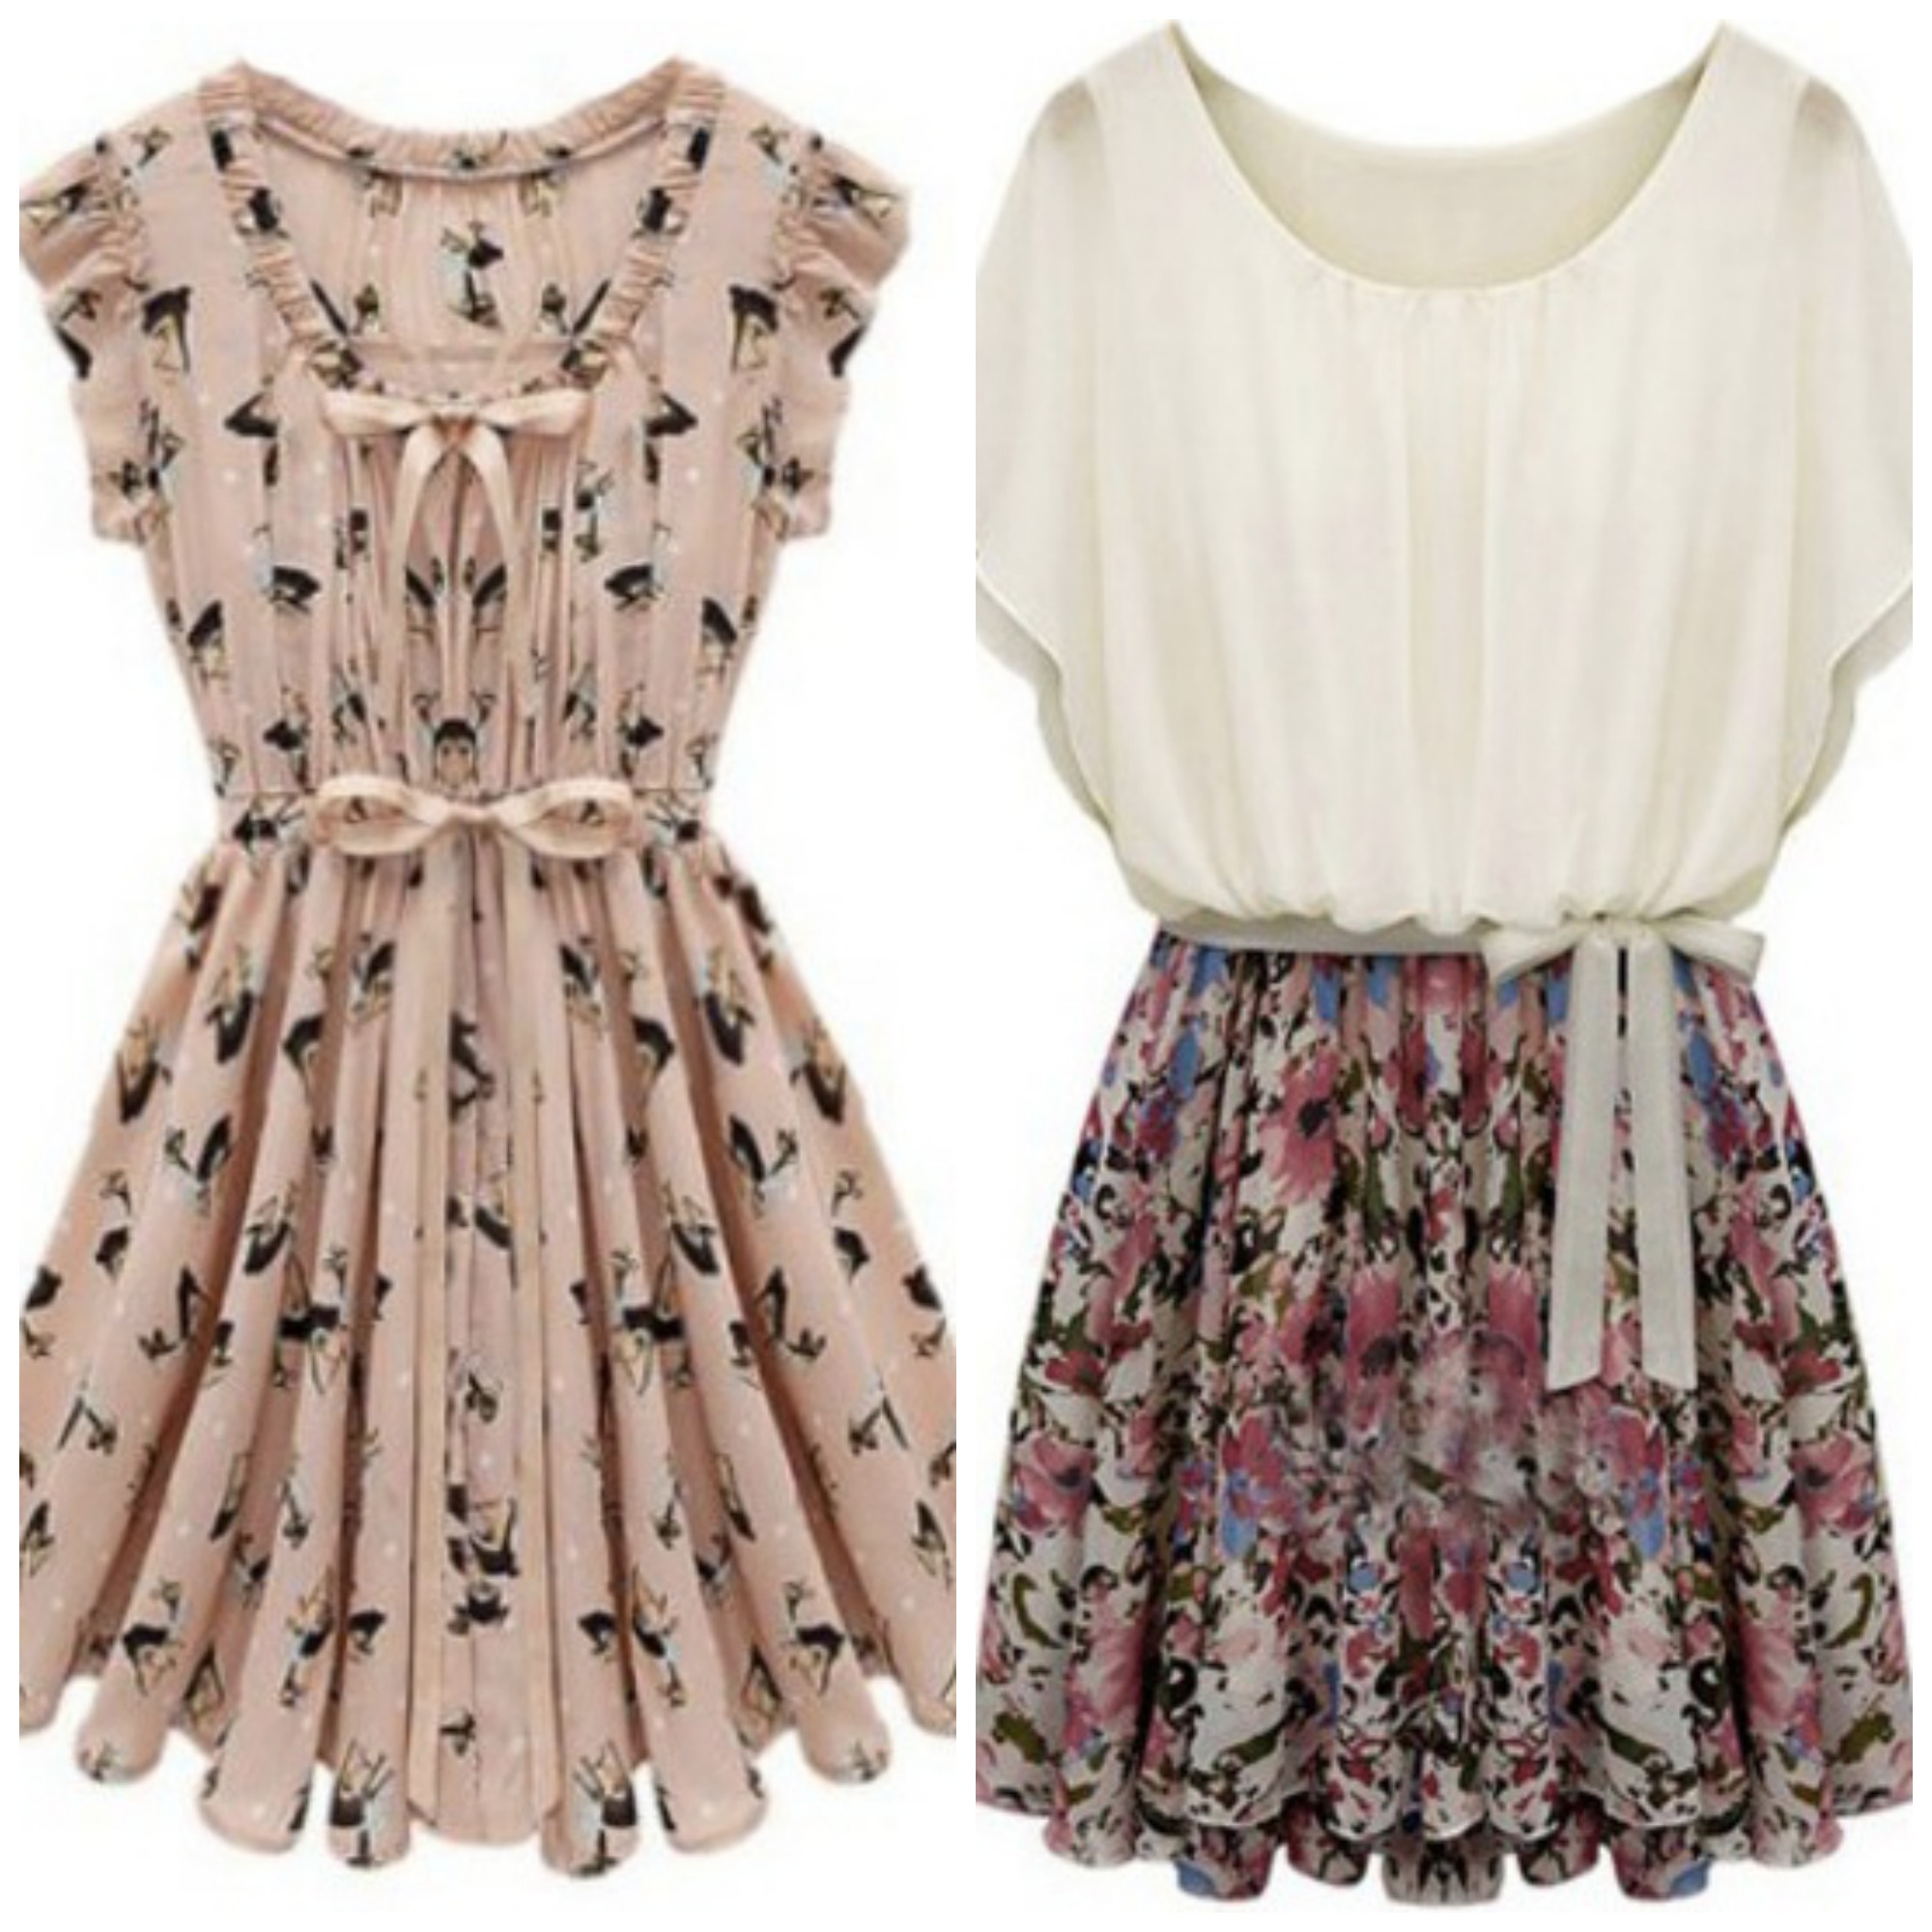 Vestidos lindos na loja Sheinside